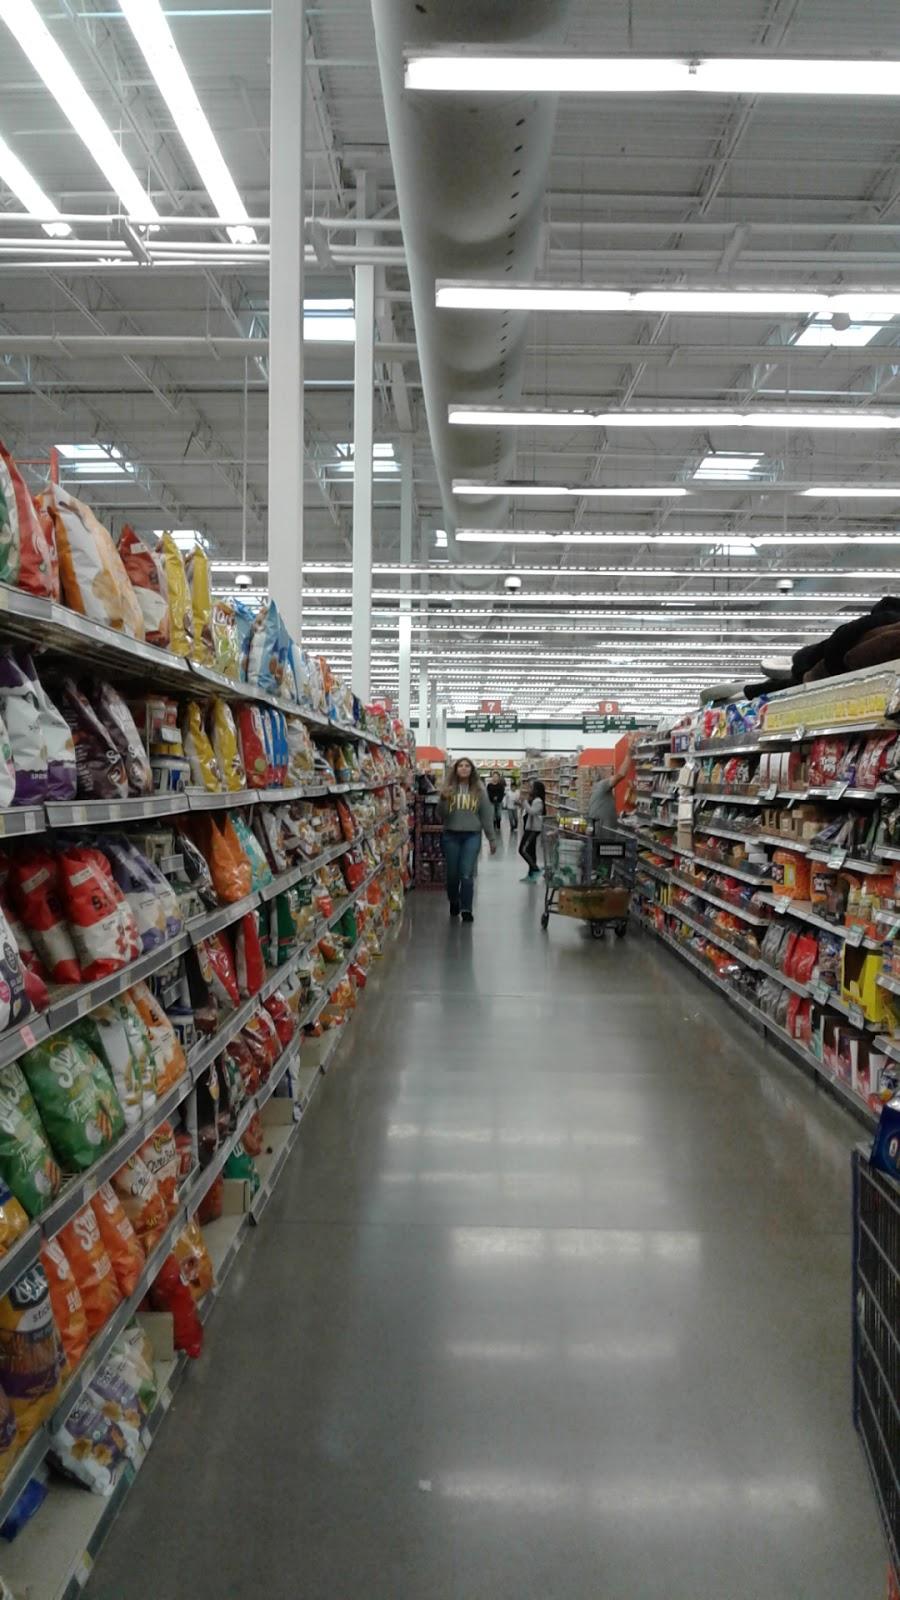 WinCo Foods - supermarket    Photo 6 of 10   Address: 1004 S Peach Ave #69, Fresno, CA 93727, USA   Phone: (559) 251-1002